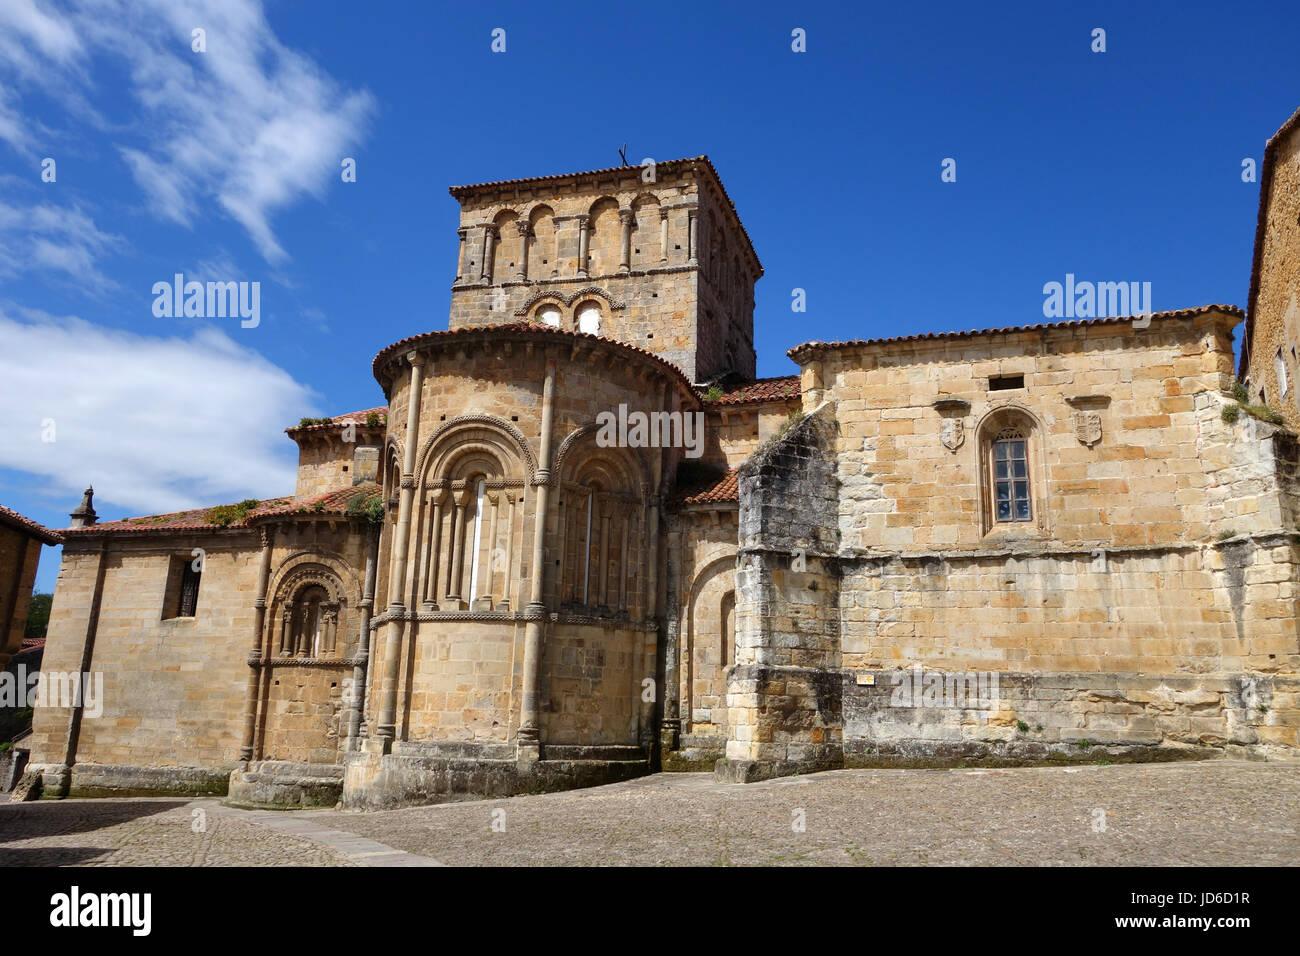 Church of the Colegiata at Santillana del Mar historic town situated in Cantabria, Spain - Stock Image